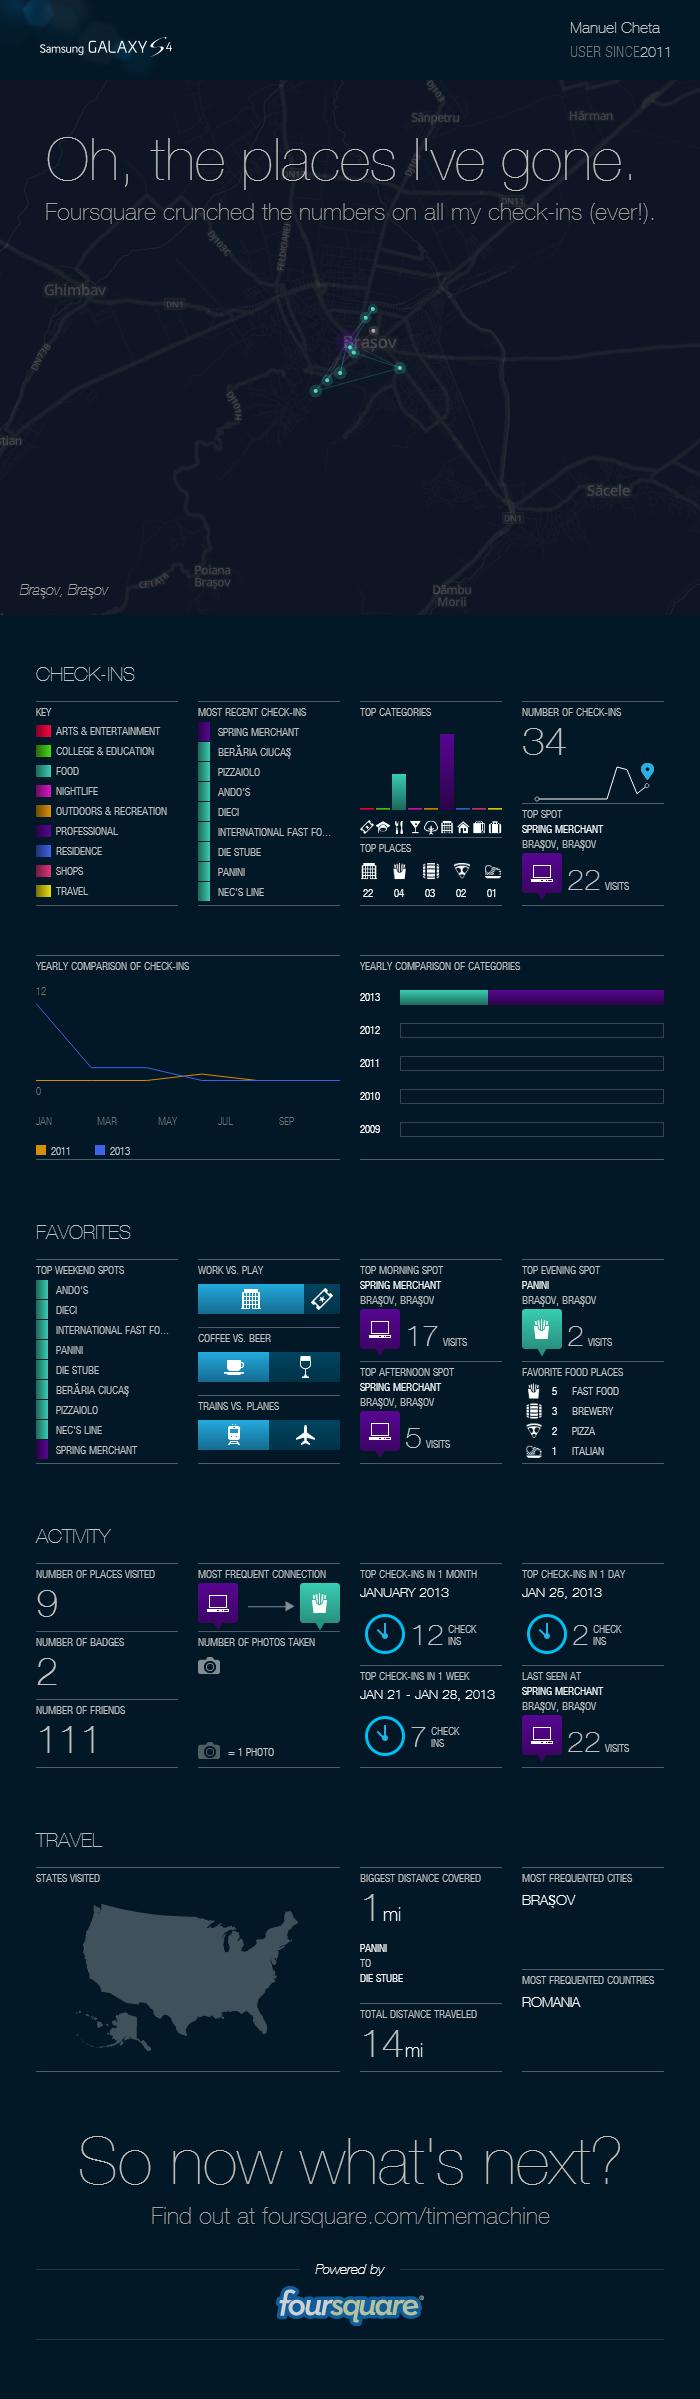 foursquare time machine example infographic